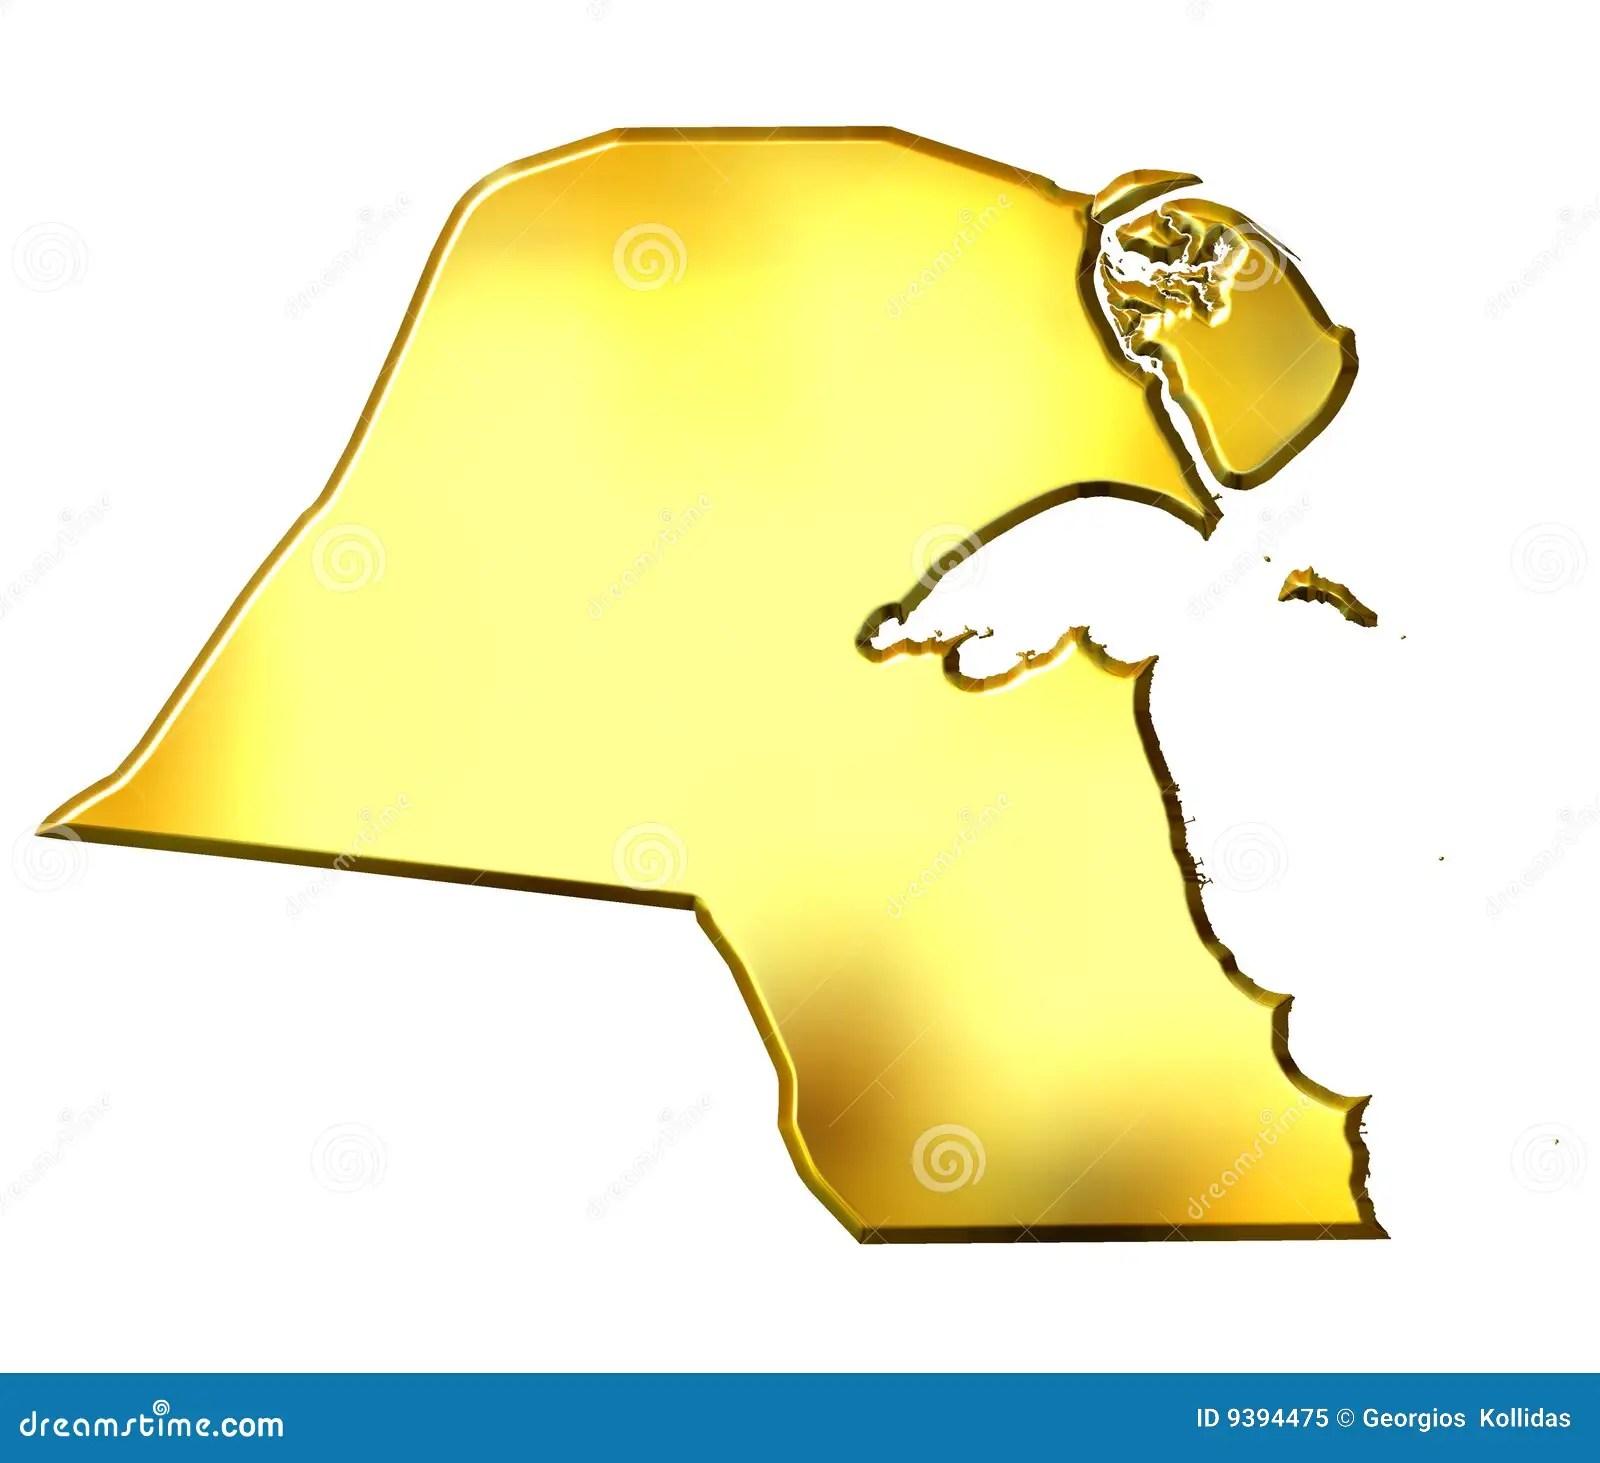 Kuwait Clip Art